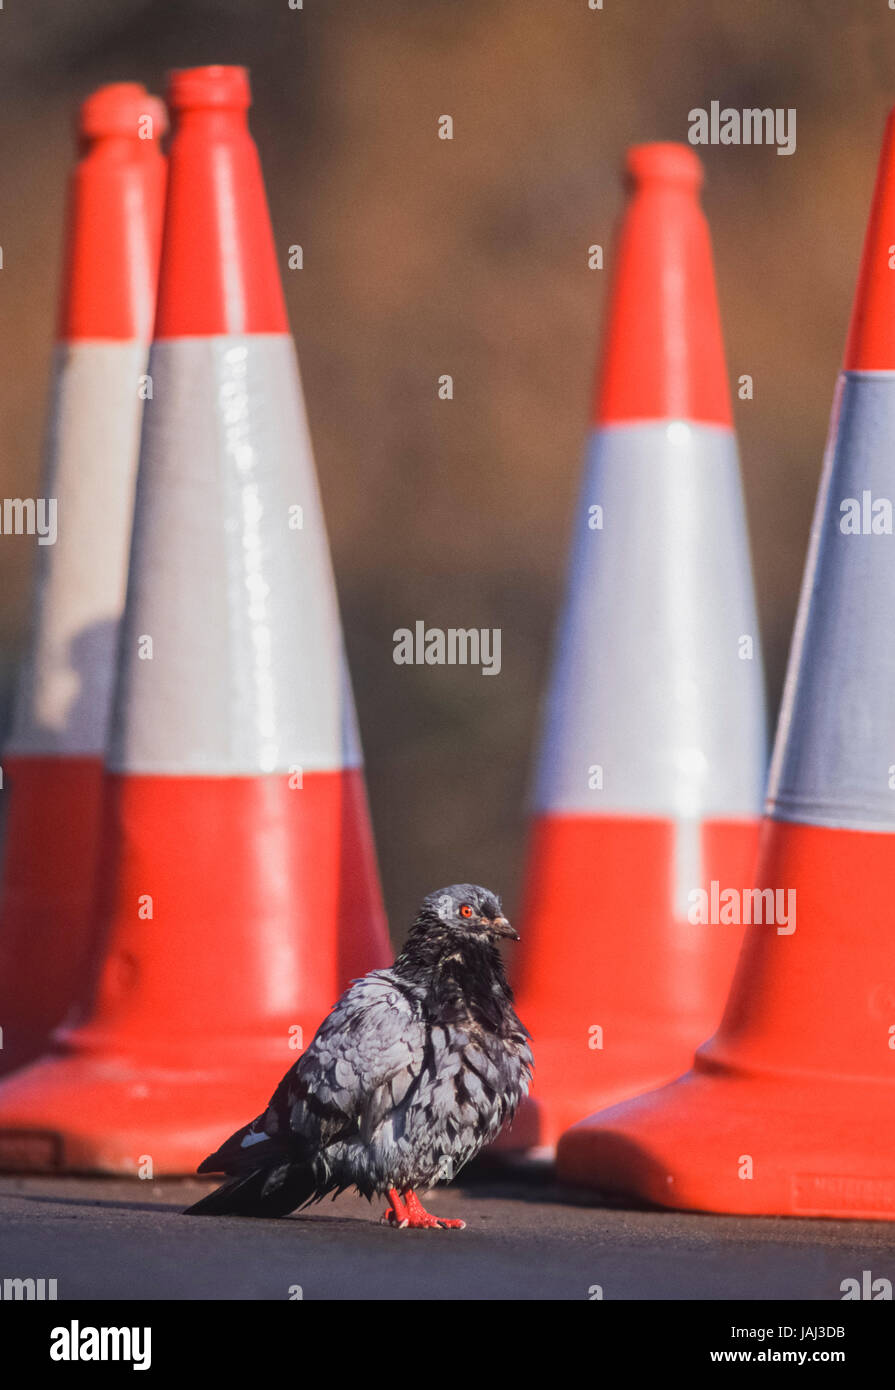 Feral Pigeon, Columba livia domestica, on road beside traffic cones, London, United Kingdom - Stock Image